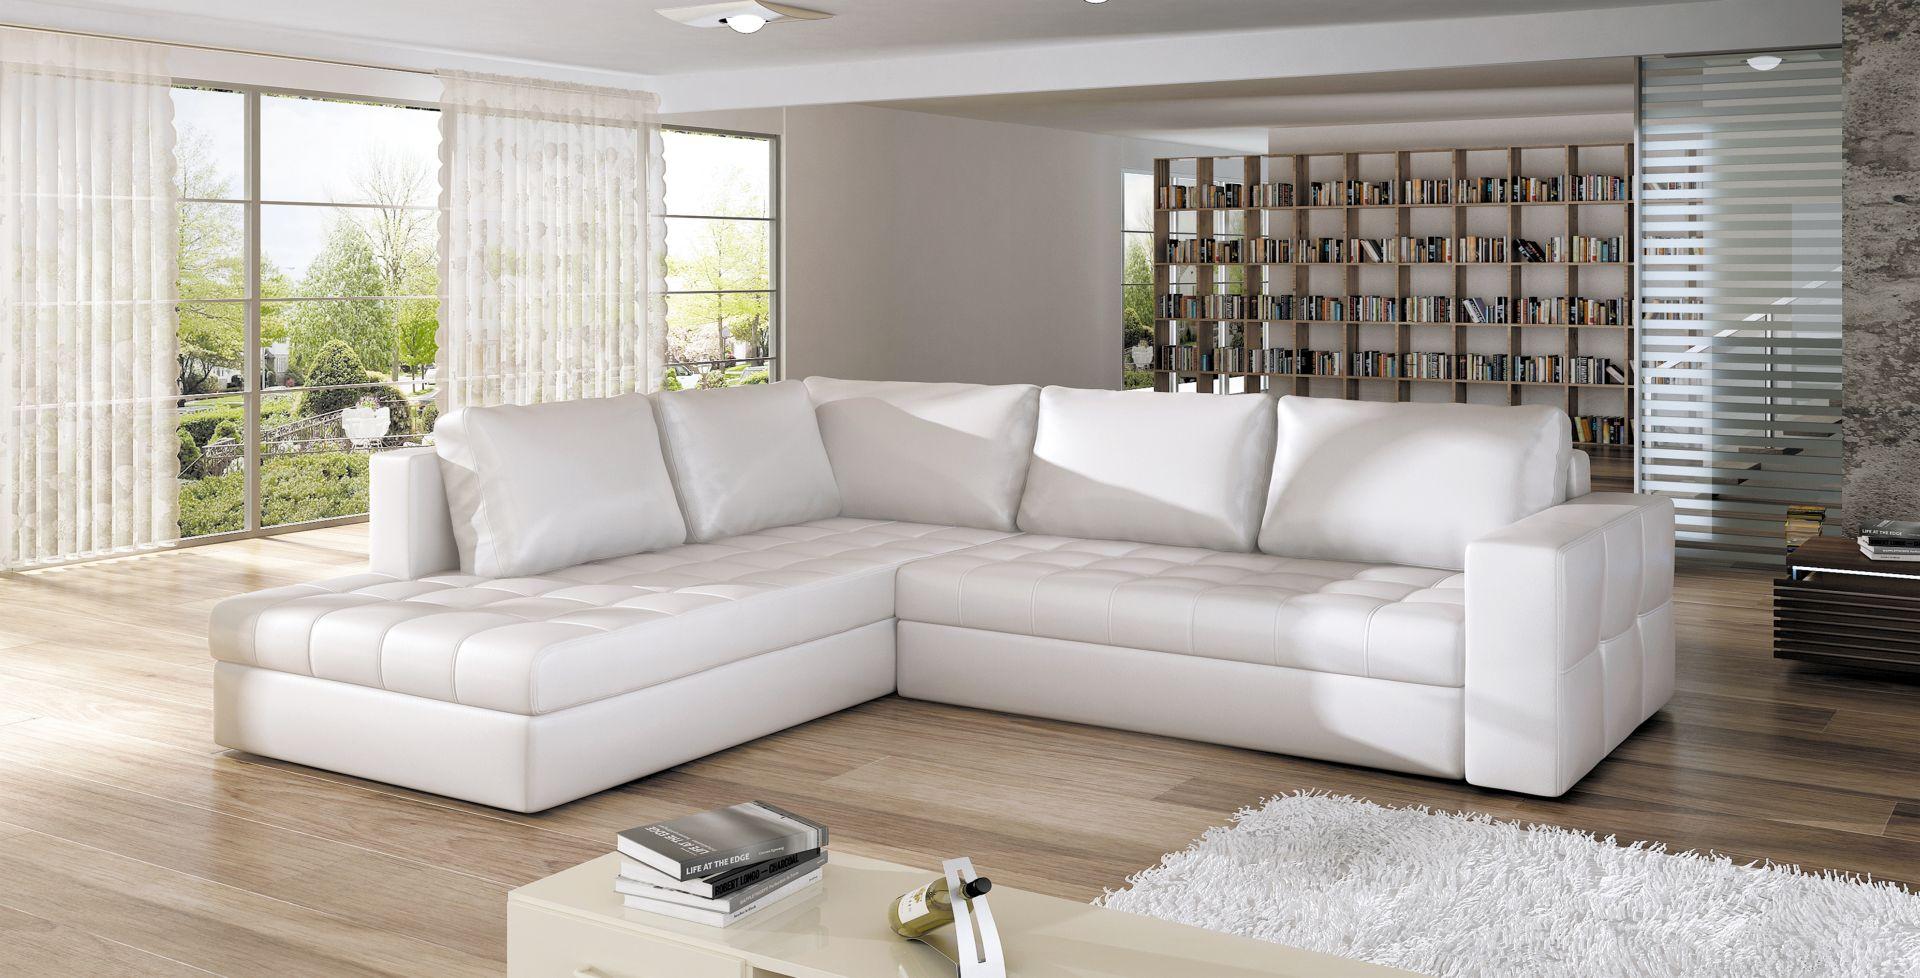 sofa schlafsofa designer sofa mit bettfunktion bettkasten ecksofa couch neu camino www. Black Bedroom Furniture Sets. Home Design Ideas